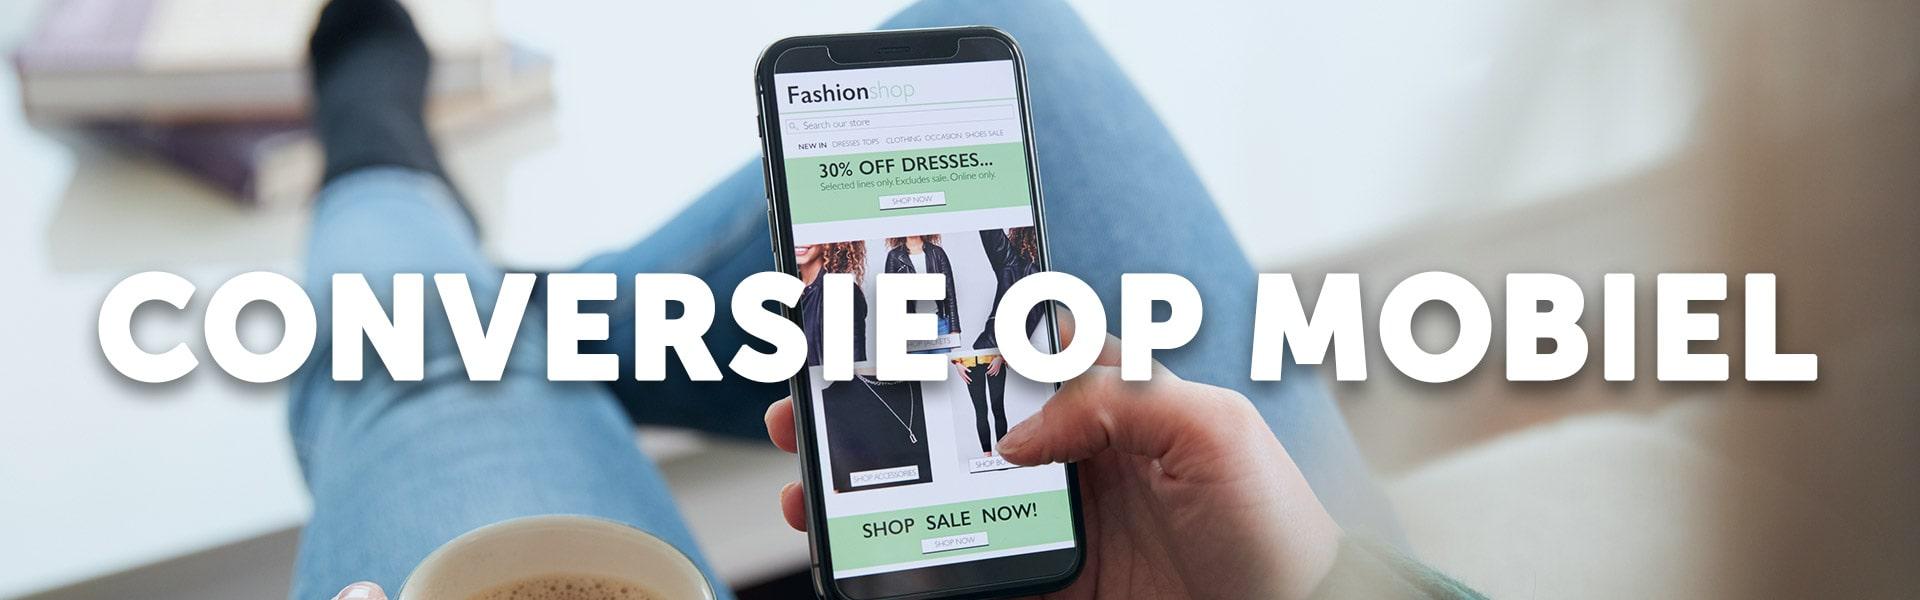 Tips voor meer conversie in je mobiele webwinkel